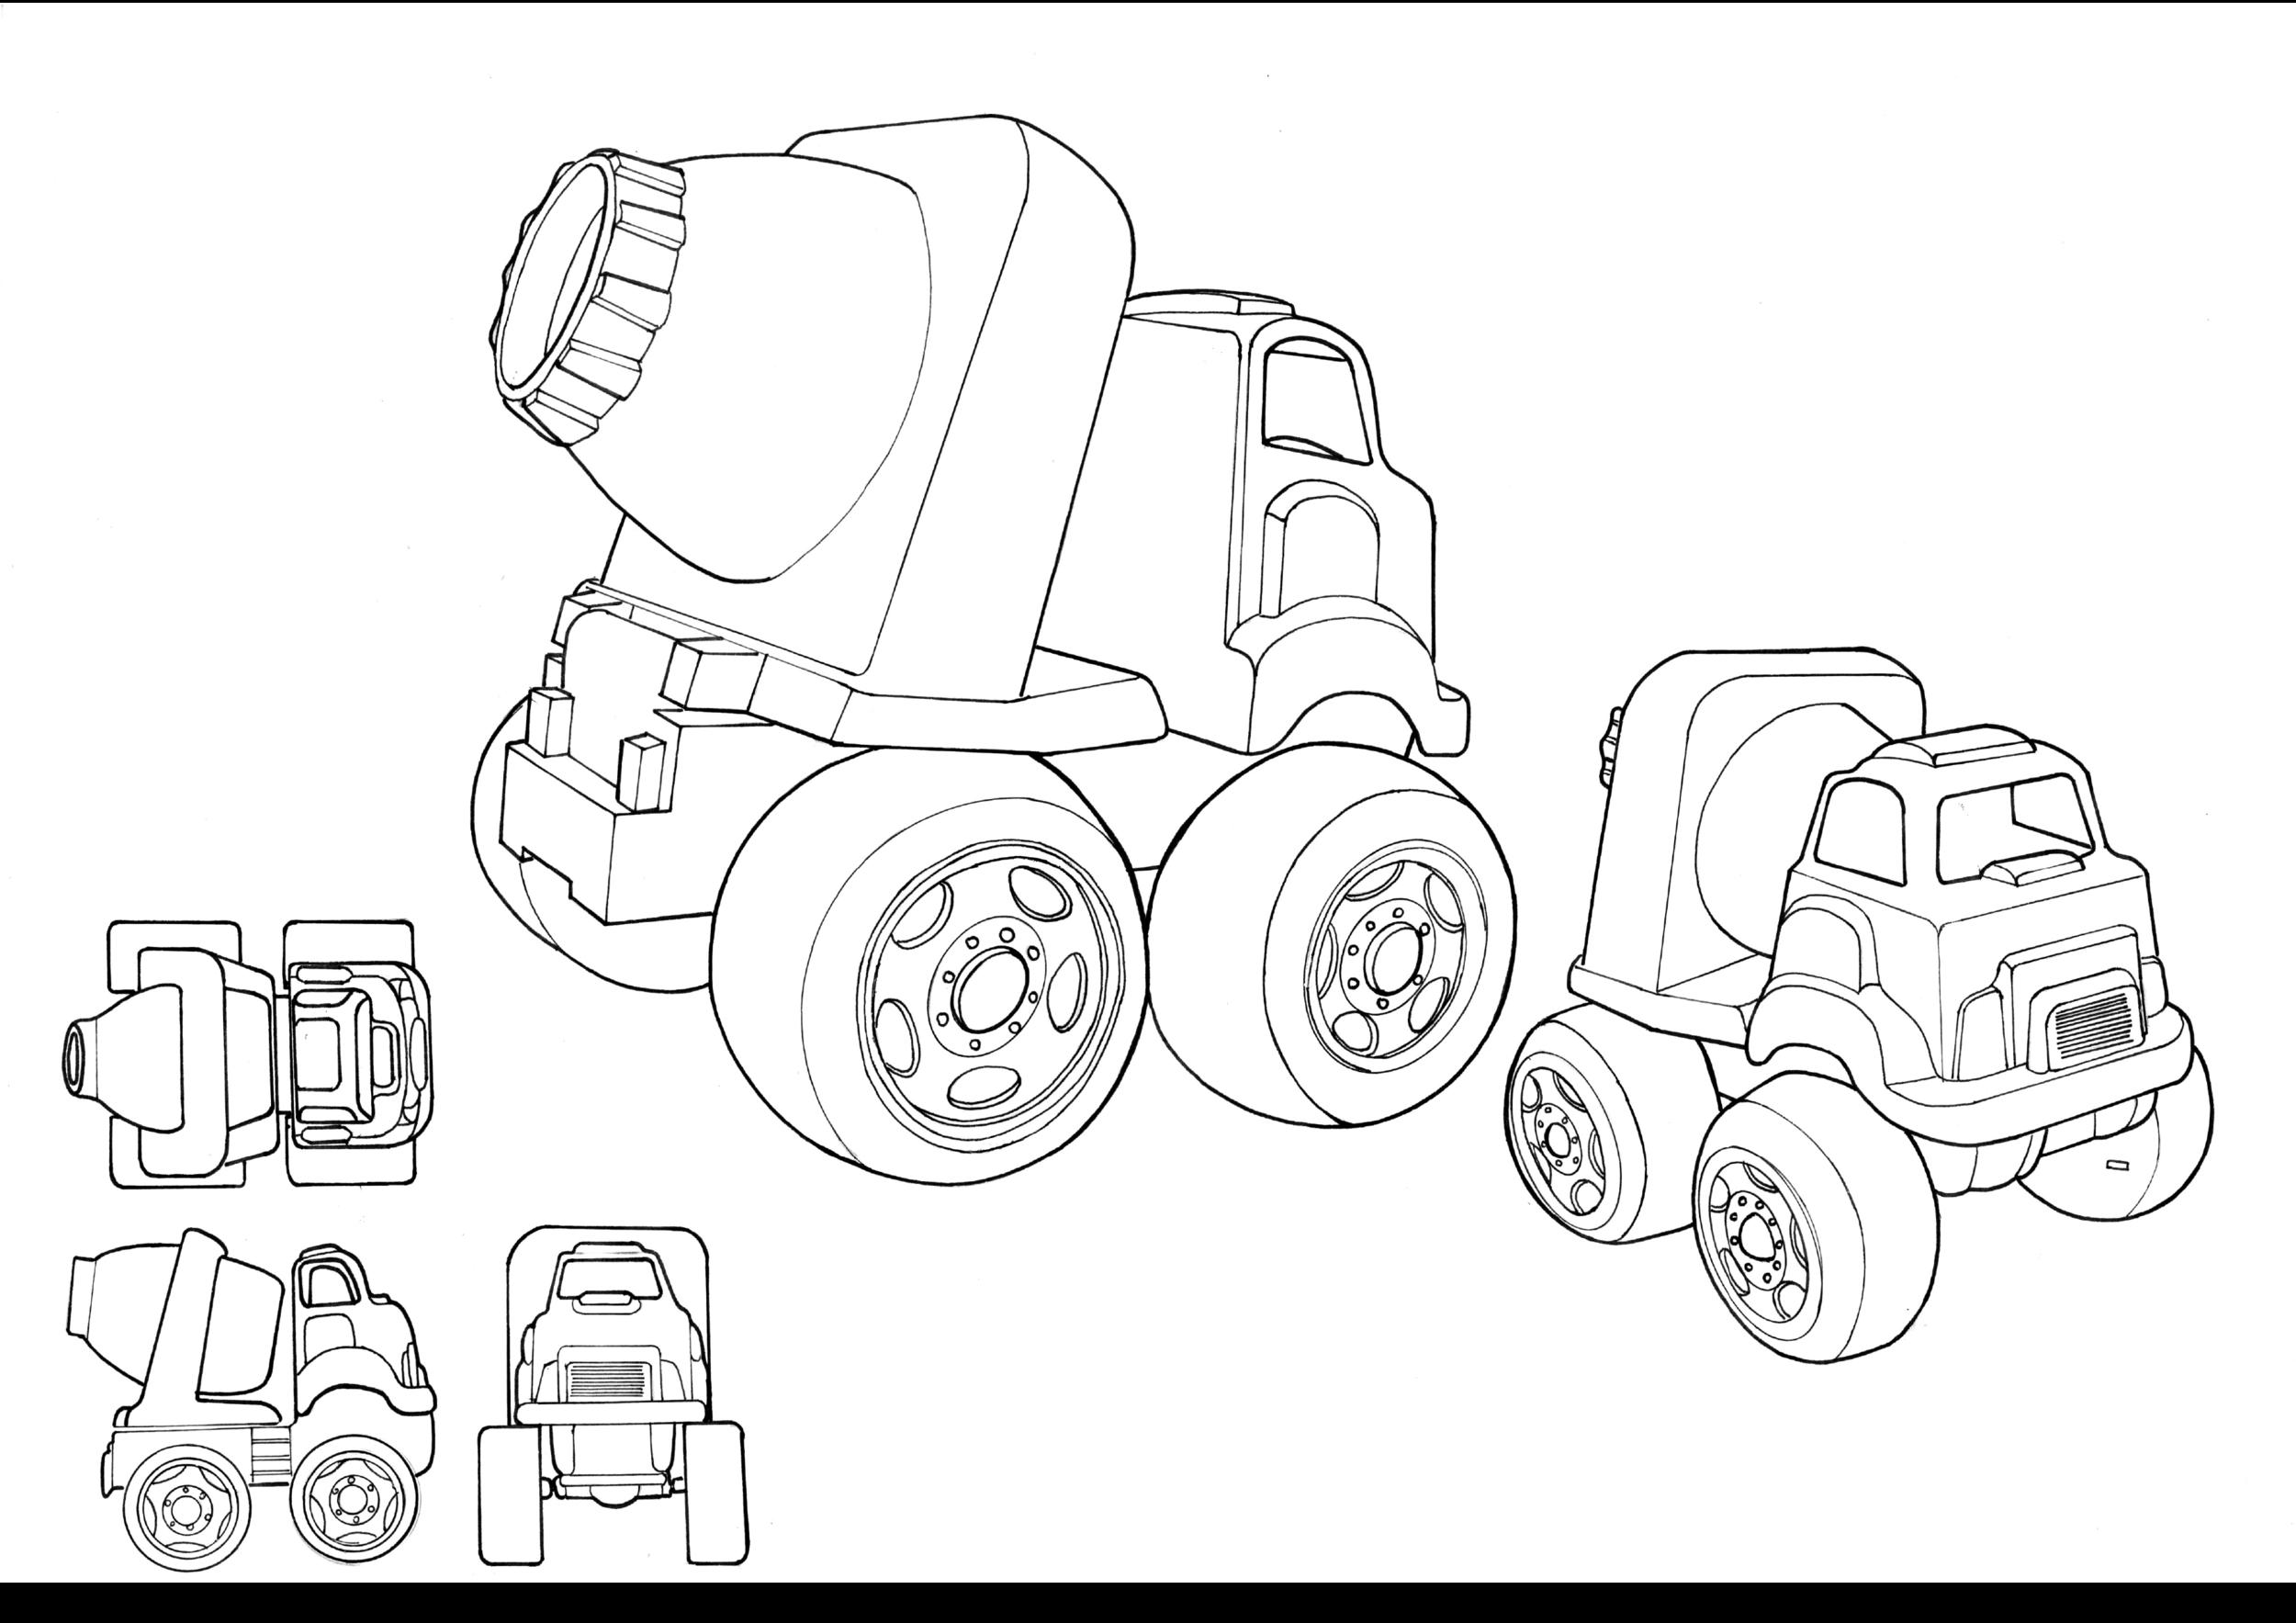 Sketch-07.png